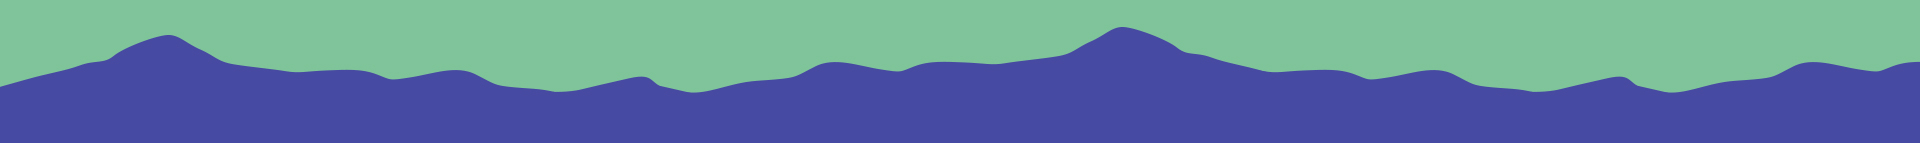 transicoes-verde-roxo